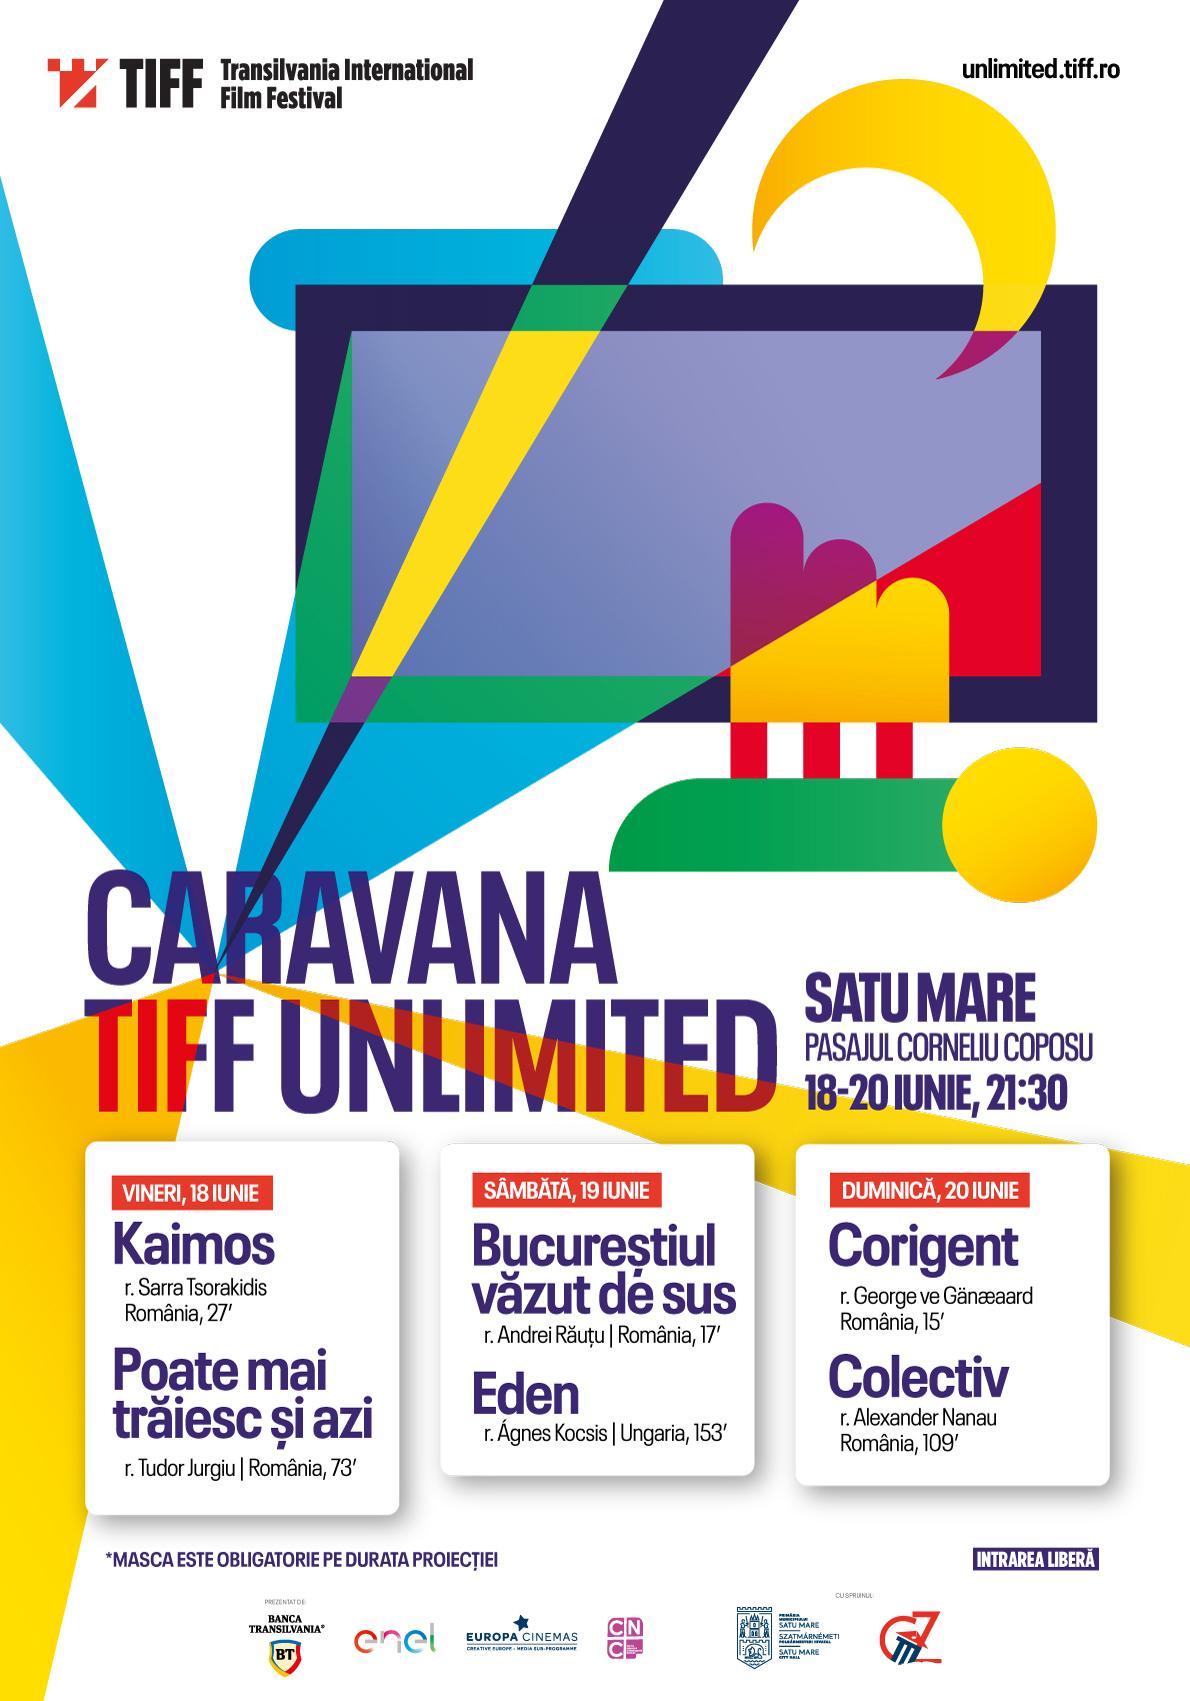 evenimente/tiff/caravana-tiff-unlimited-70x100-satu-mare-preview-07.jpg